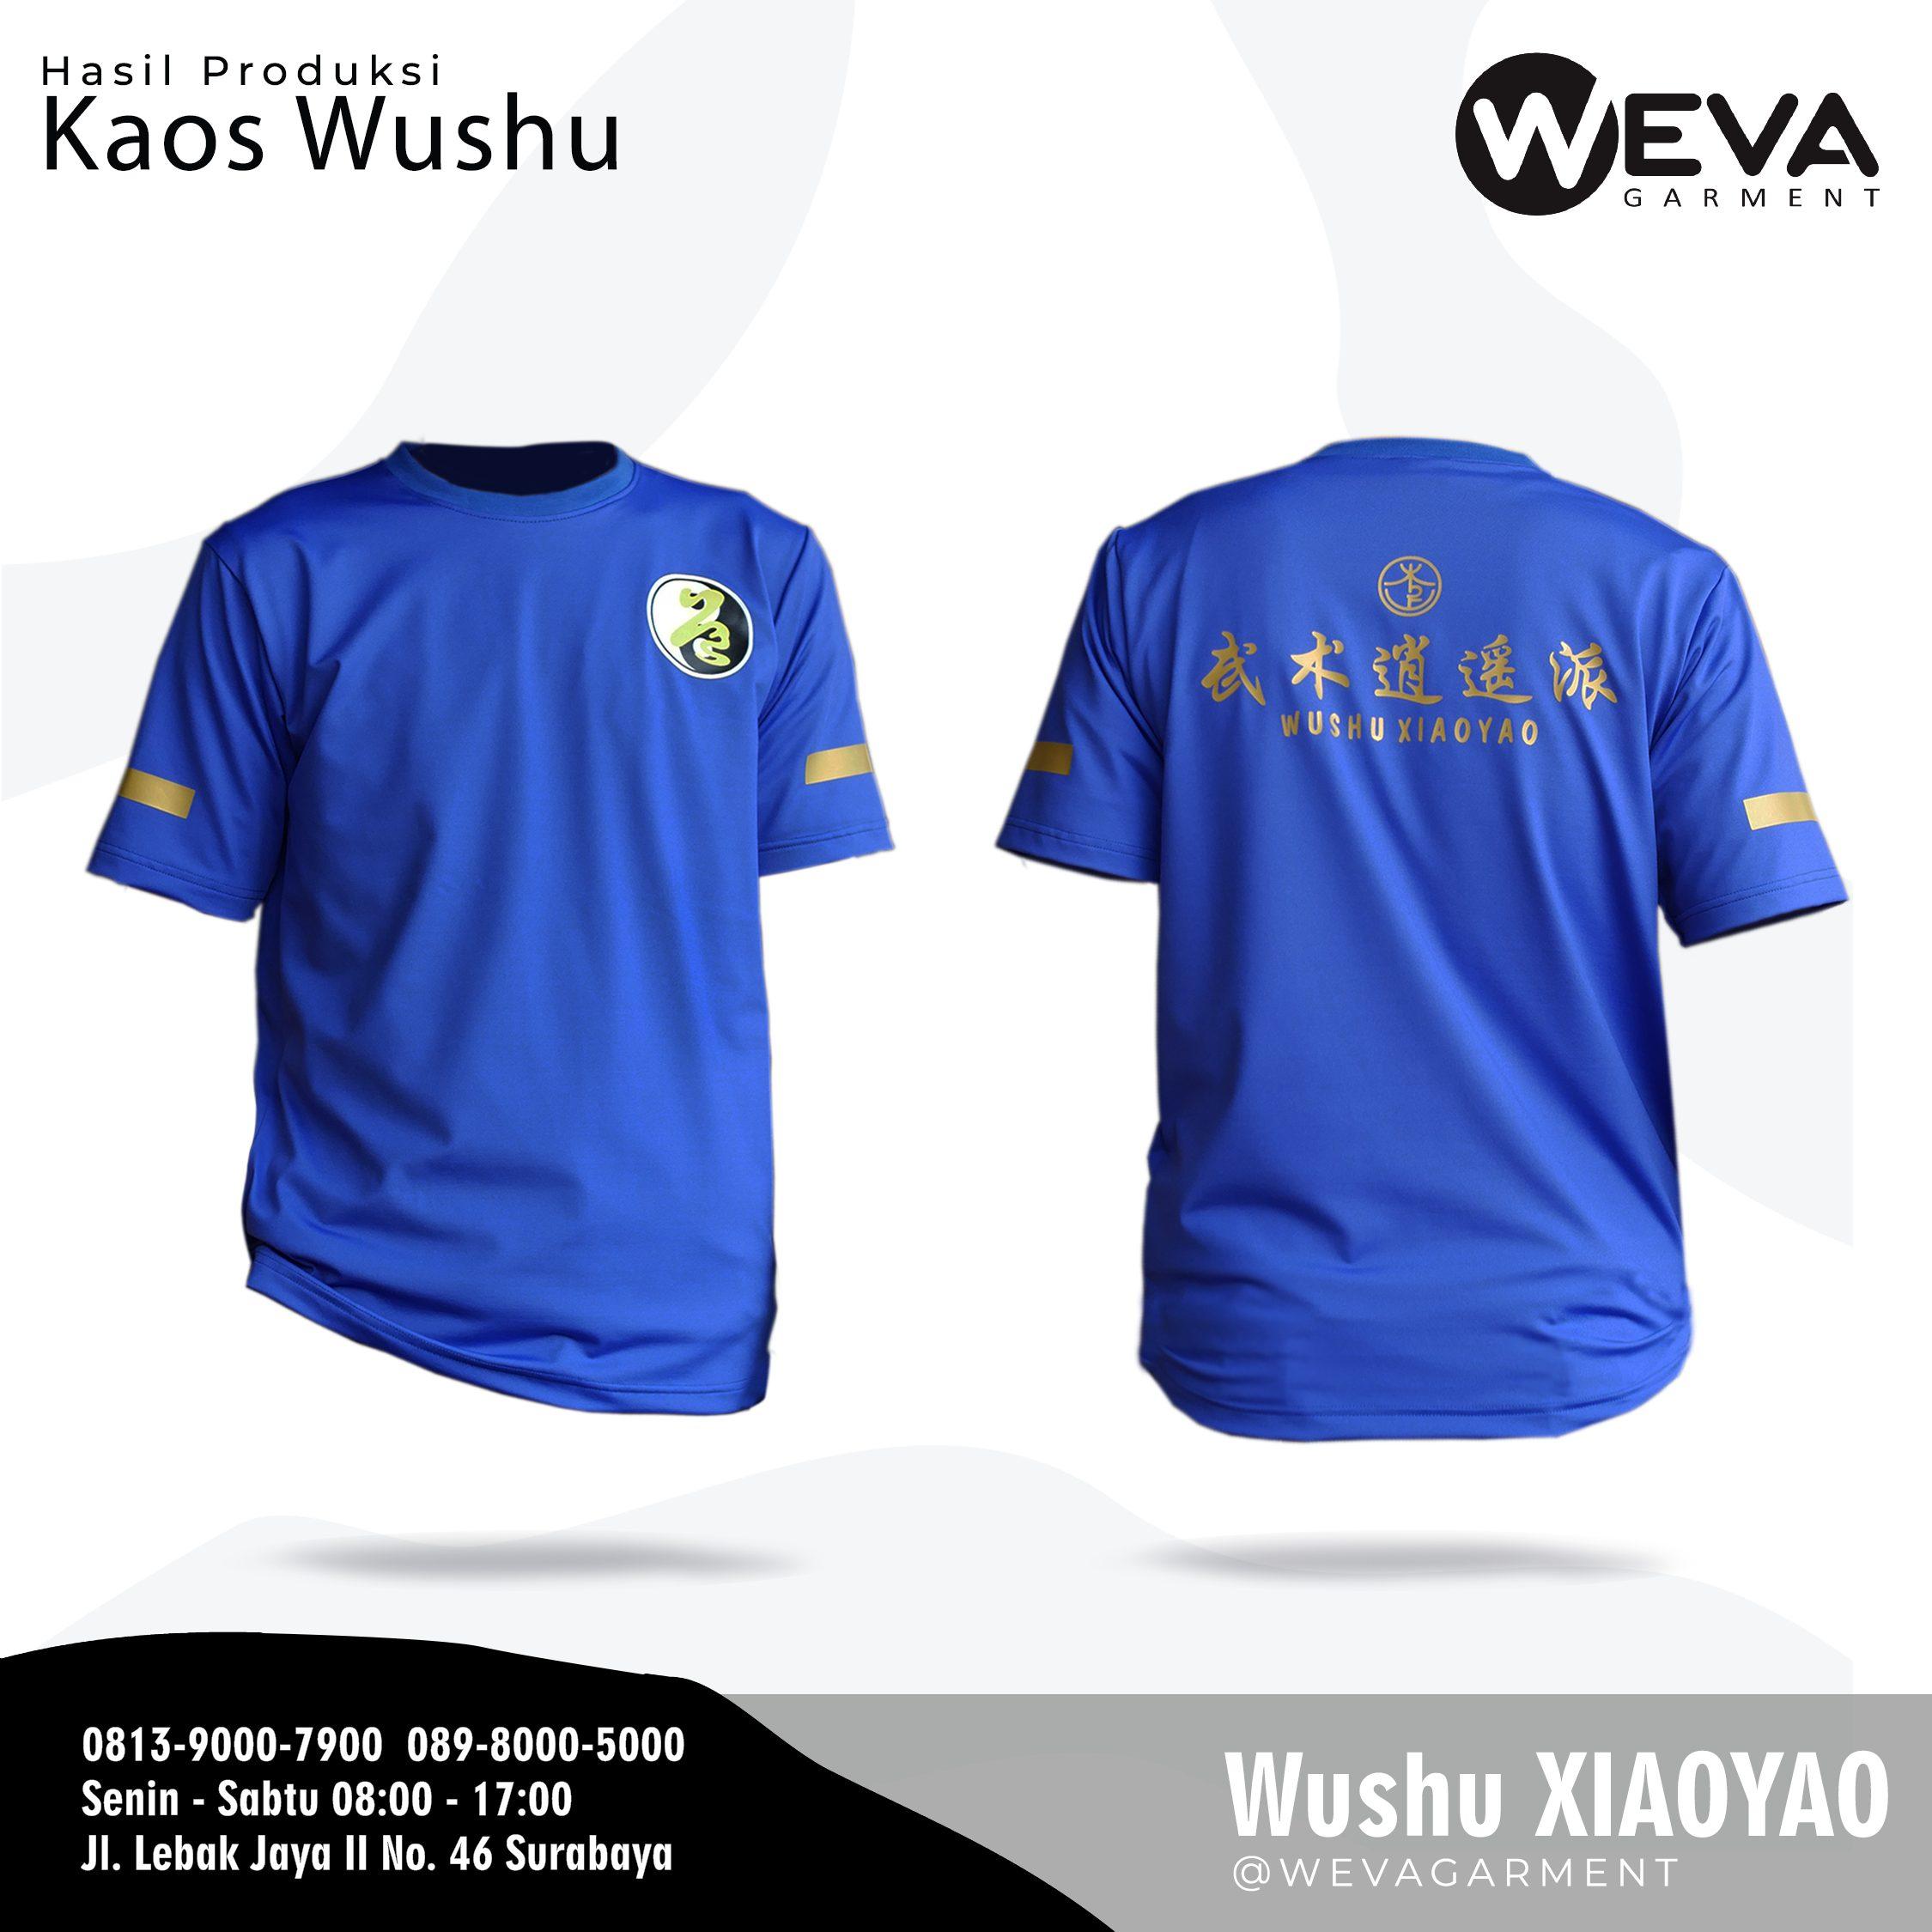 Hasil Produksi dan Desain Kaos Poloshirt, Kaos Jersey Xiao Yao